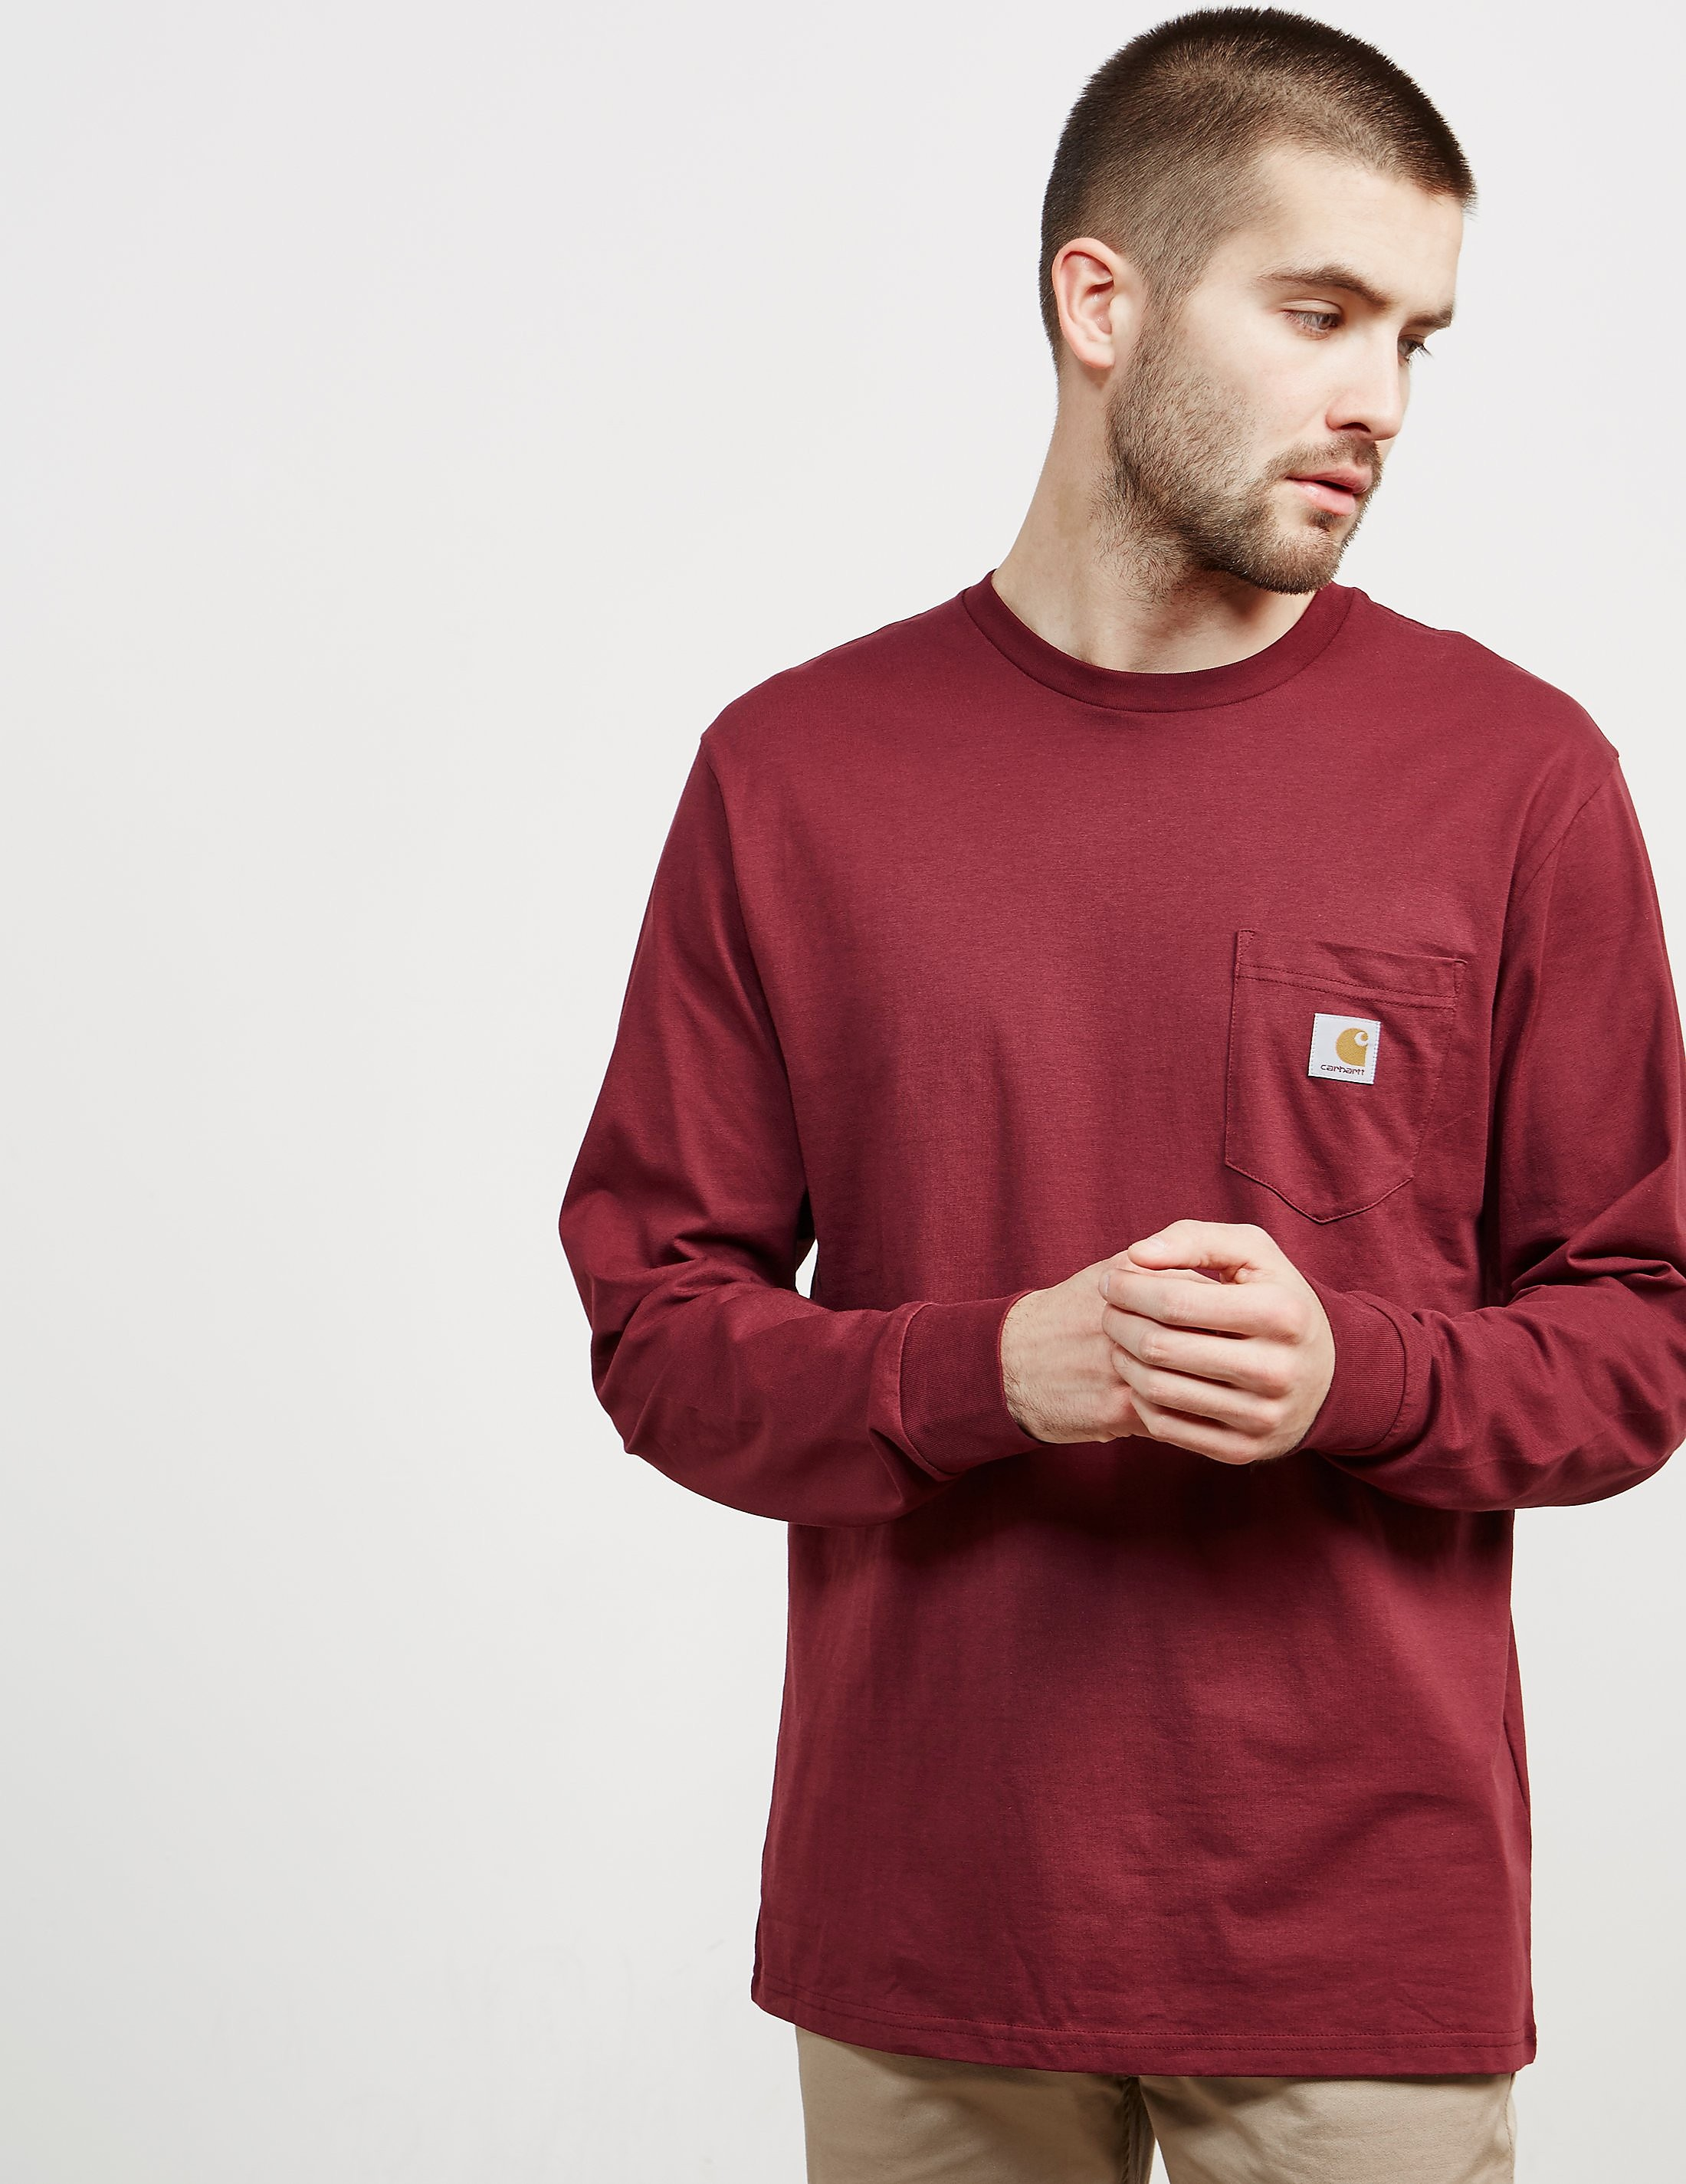 Carhartt WIP Pocket Long Sleeved T-Shirt